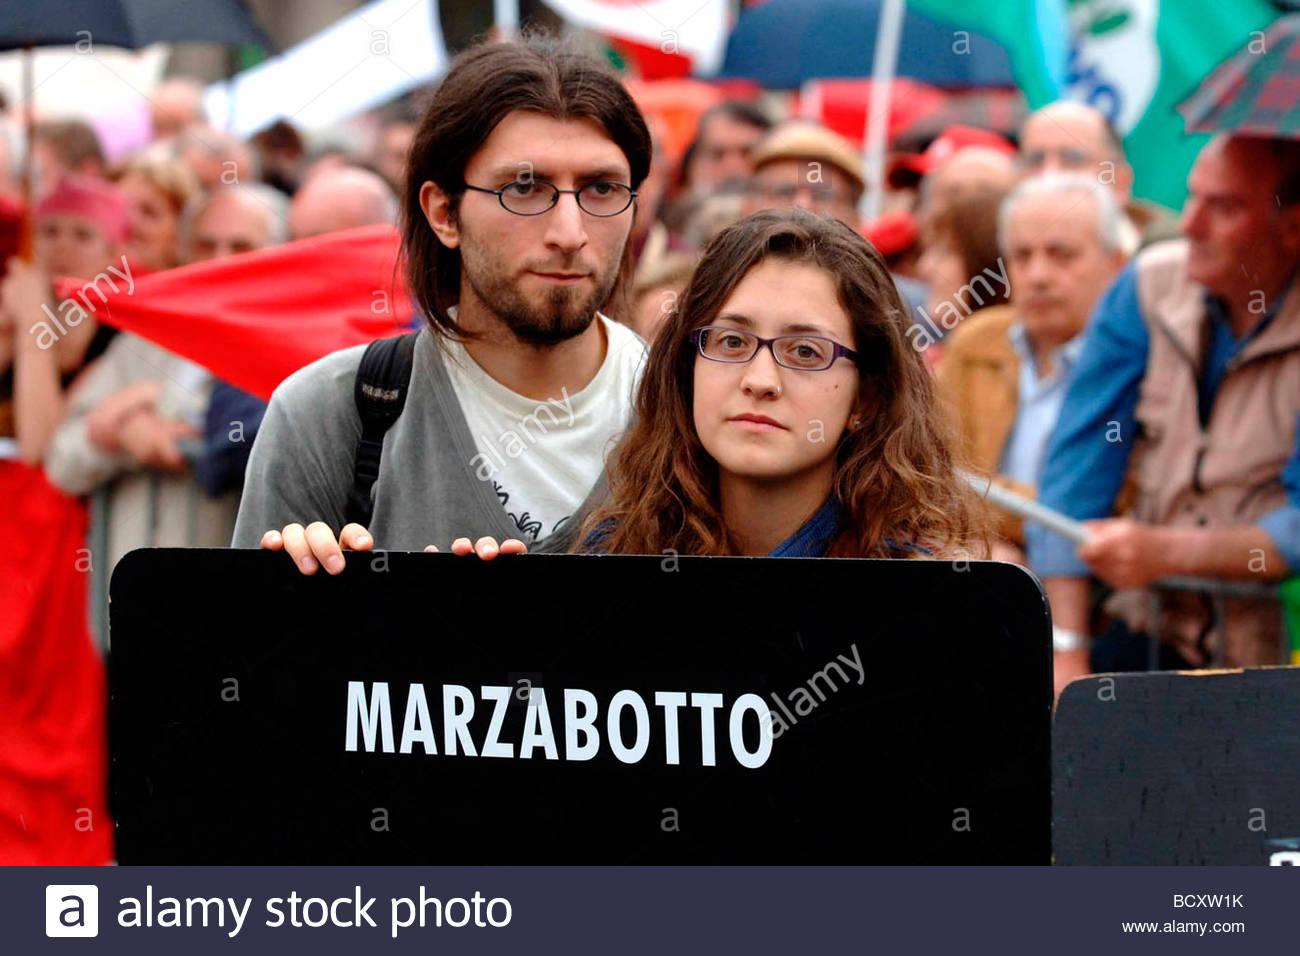 milan, 25 april demonstration Stock Photo